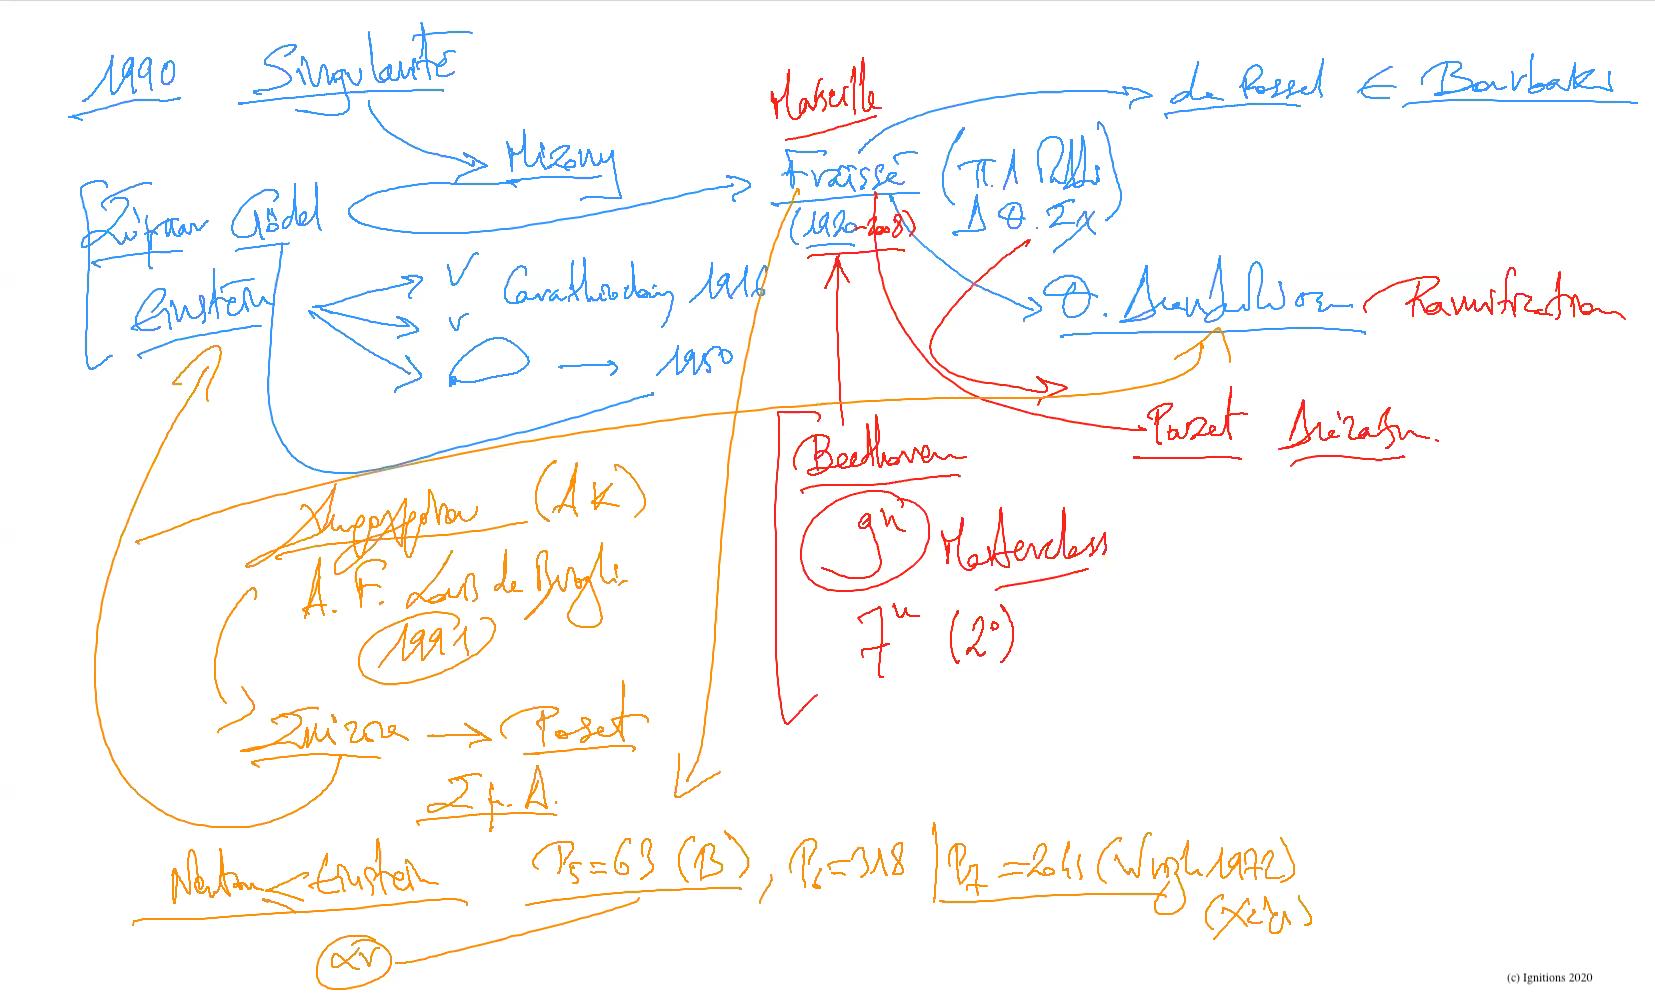 57296 - V - Το Μαθηματικό Έργο της Ανθρωπότητας. Έργο IX. (Dessin)